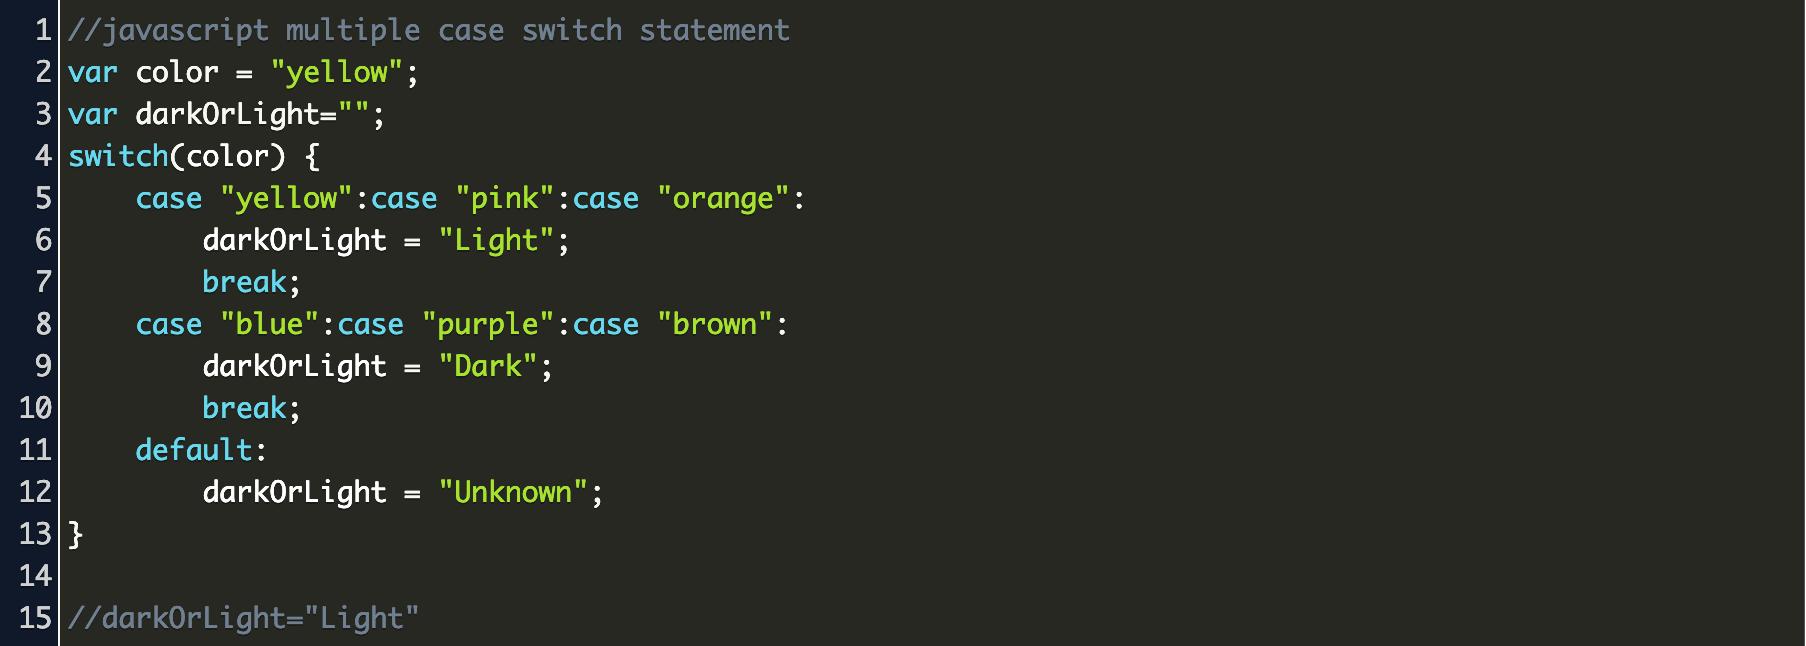 javascript switch statement case multiple returns value Code Example